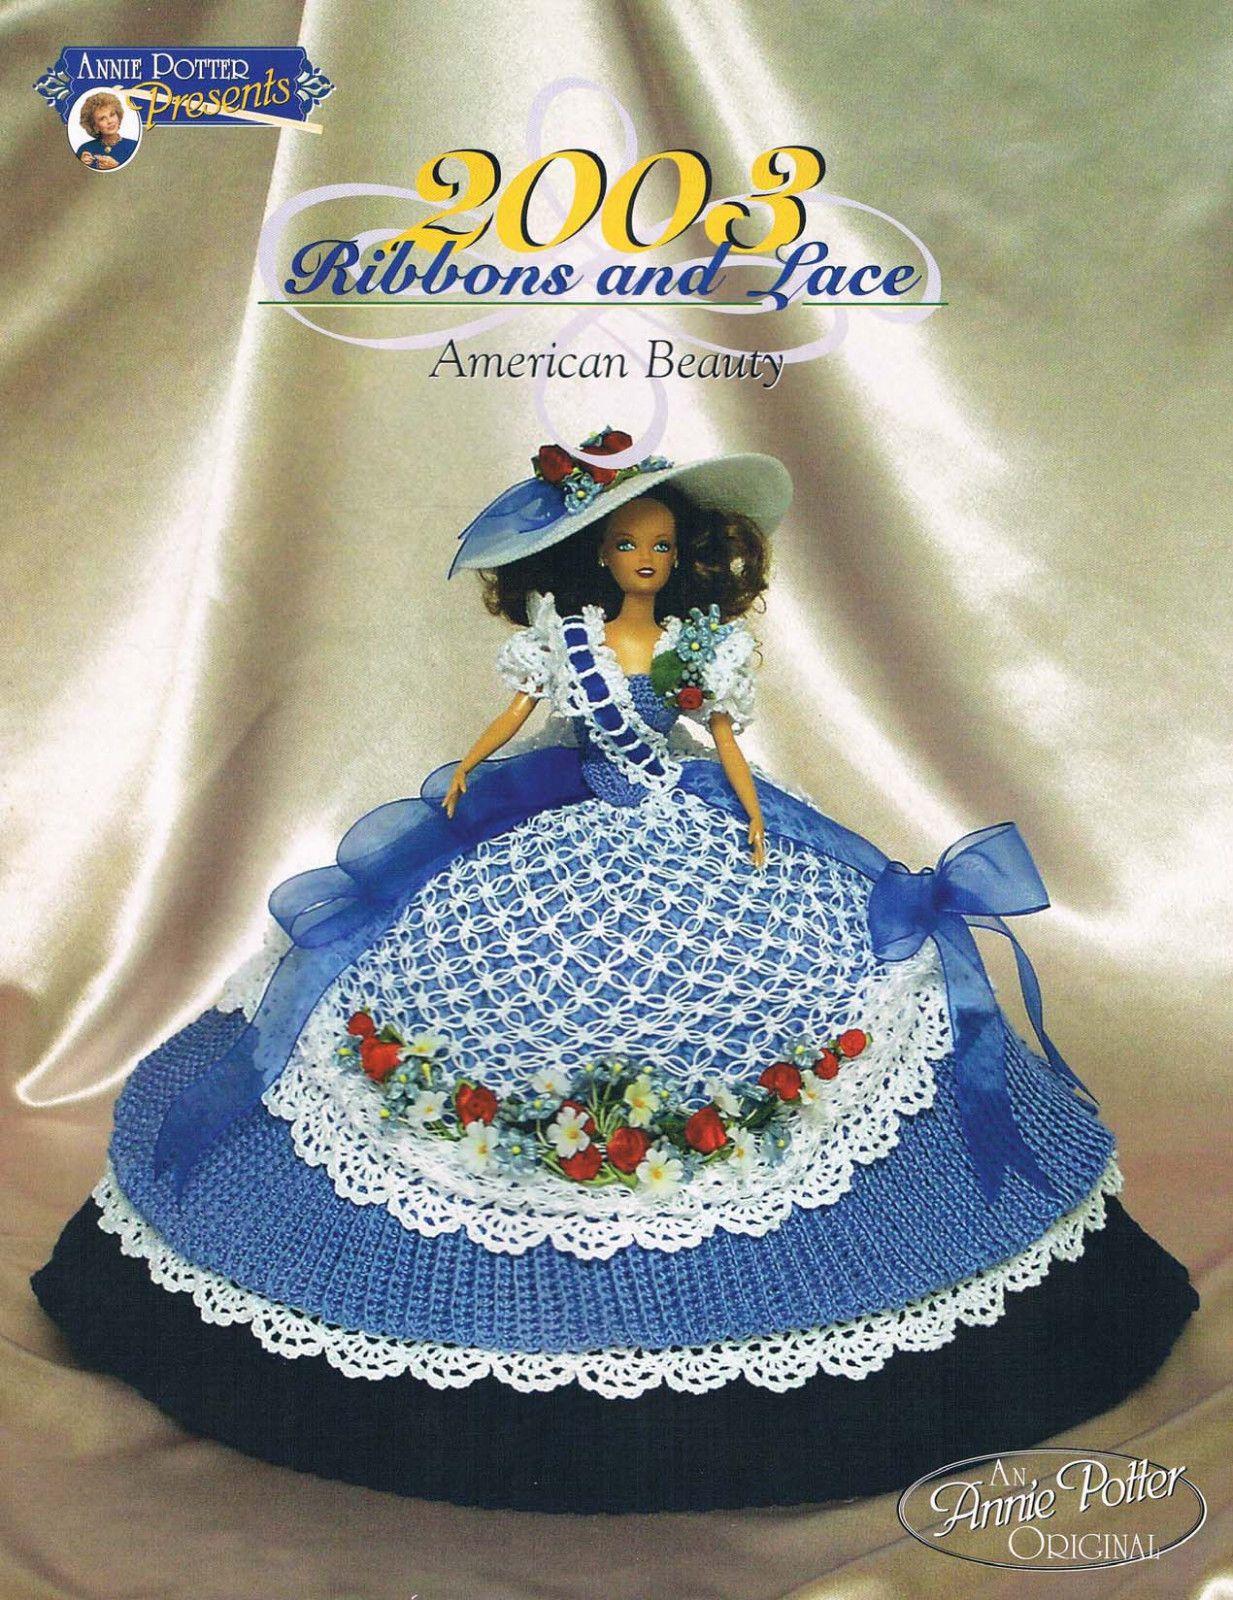 Crochet Annie Potter 2003 American Beauty Bed Doll Crochet Doll